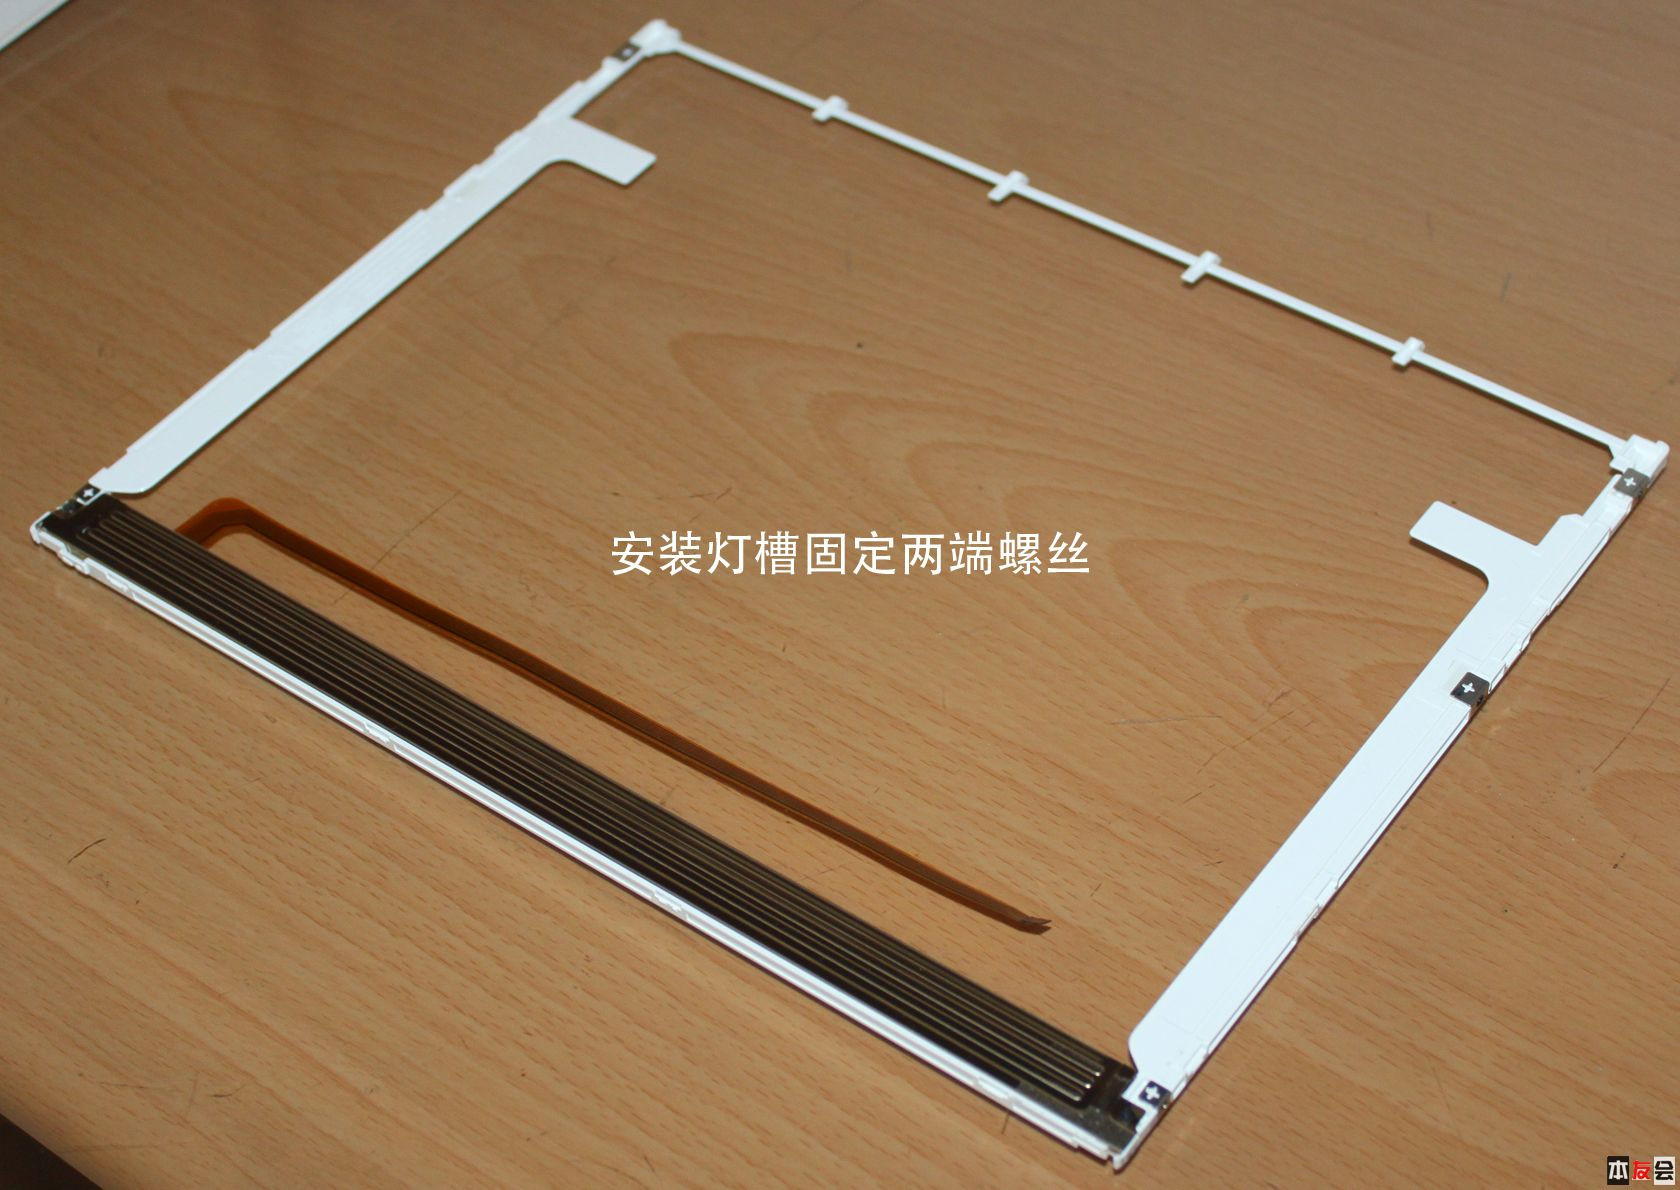 x61笔记本背光改led,我的经典之作哦!